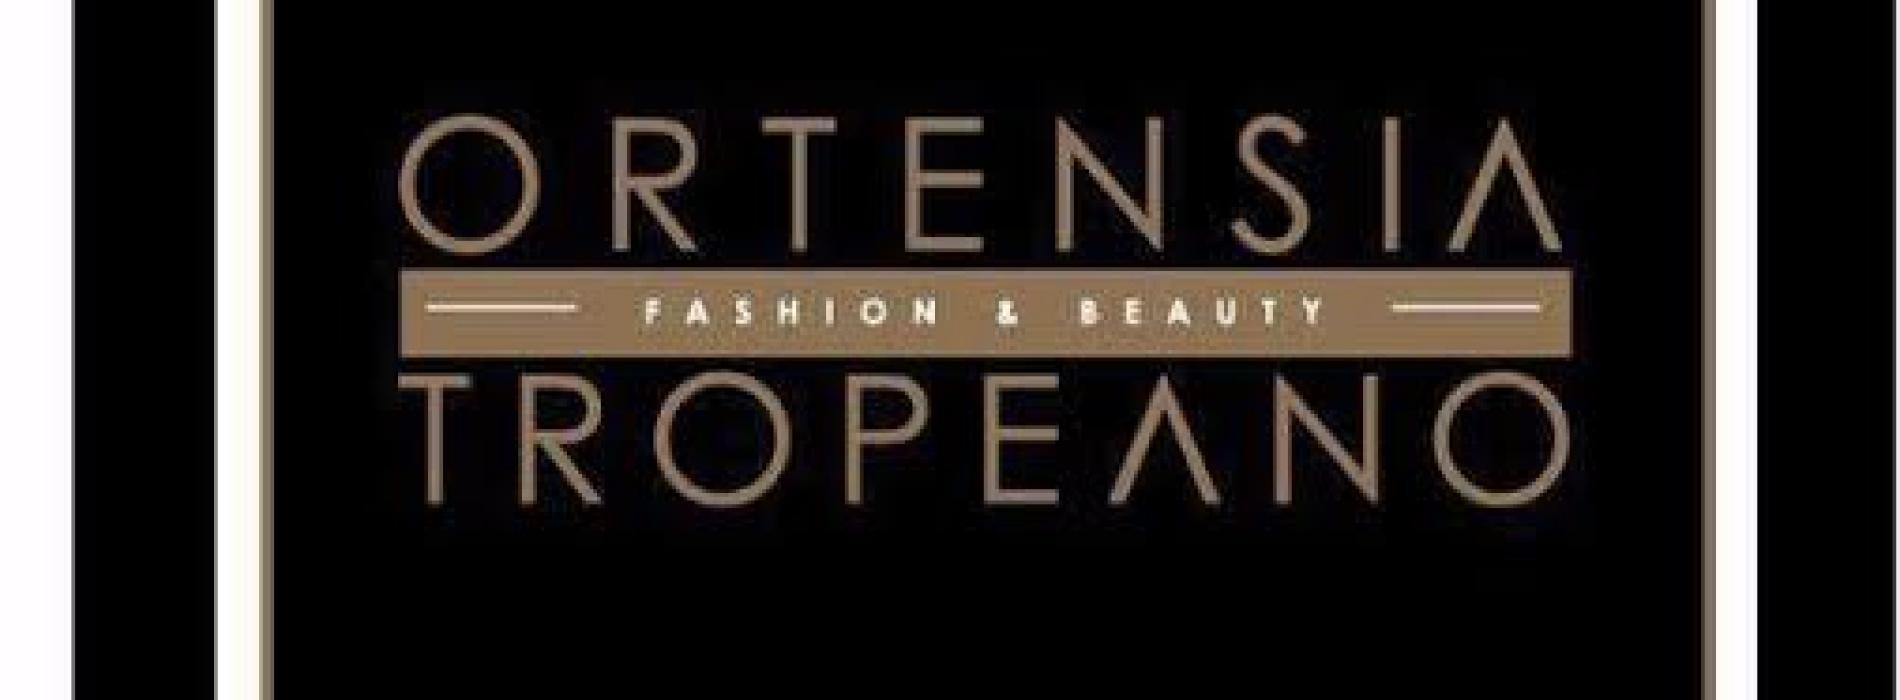 Ortensia Tropeano Fashion & Beauty. Estetica, Make Up, Trendy Bar, Fashion Corner